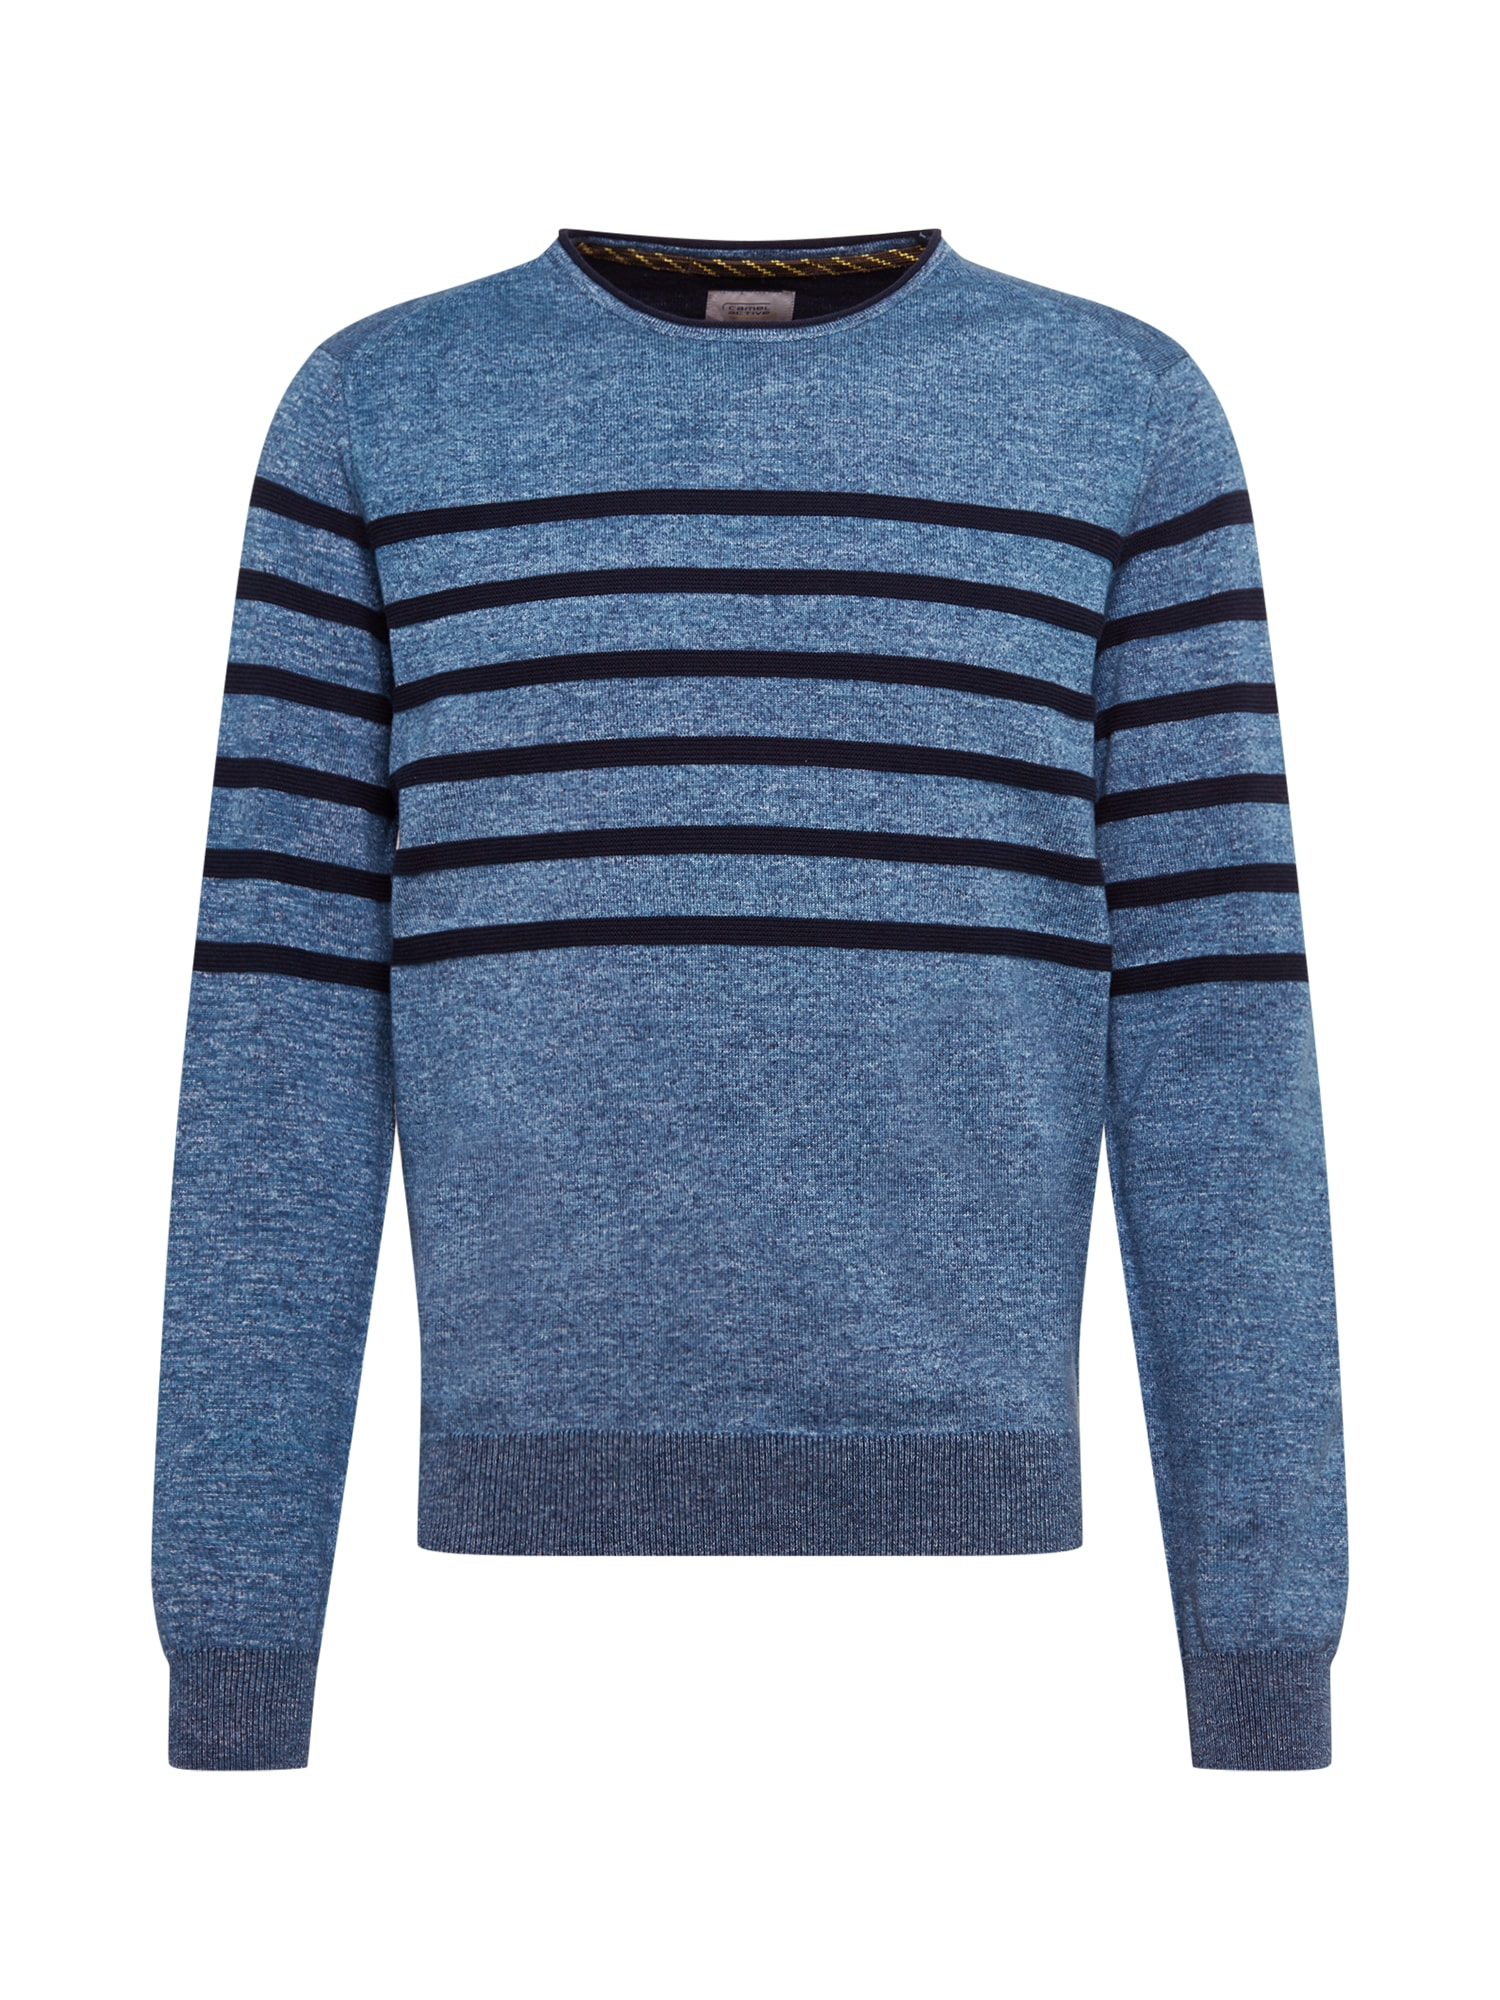 CAMEL ACTIVE Megztinis mėlyna / juoda